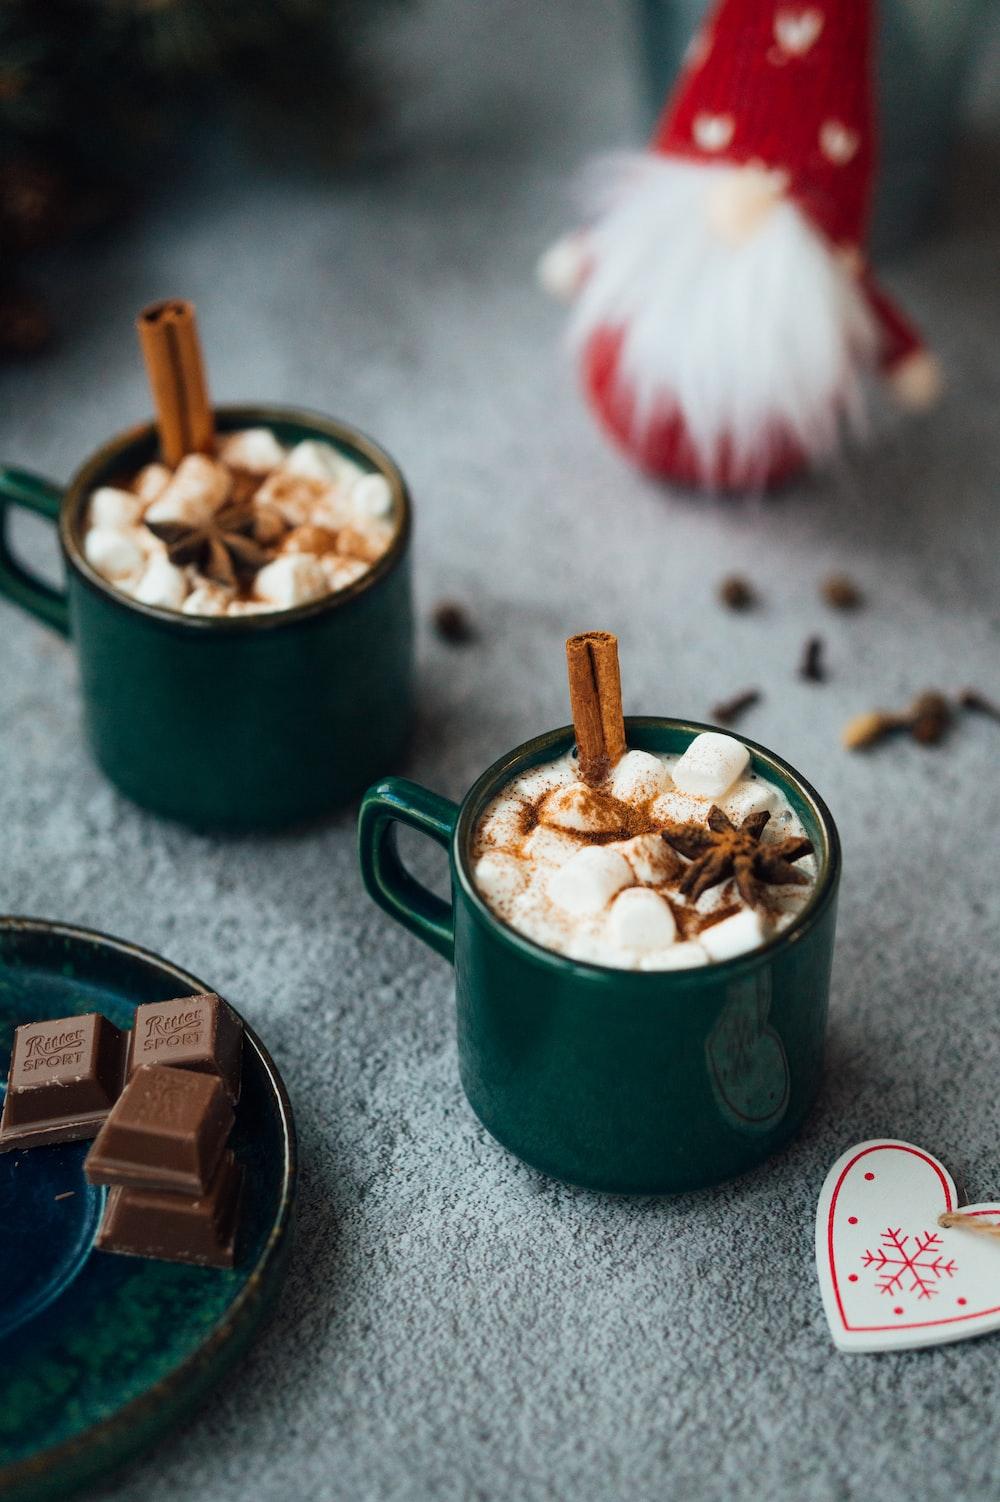 green ceramic mug with ice cream